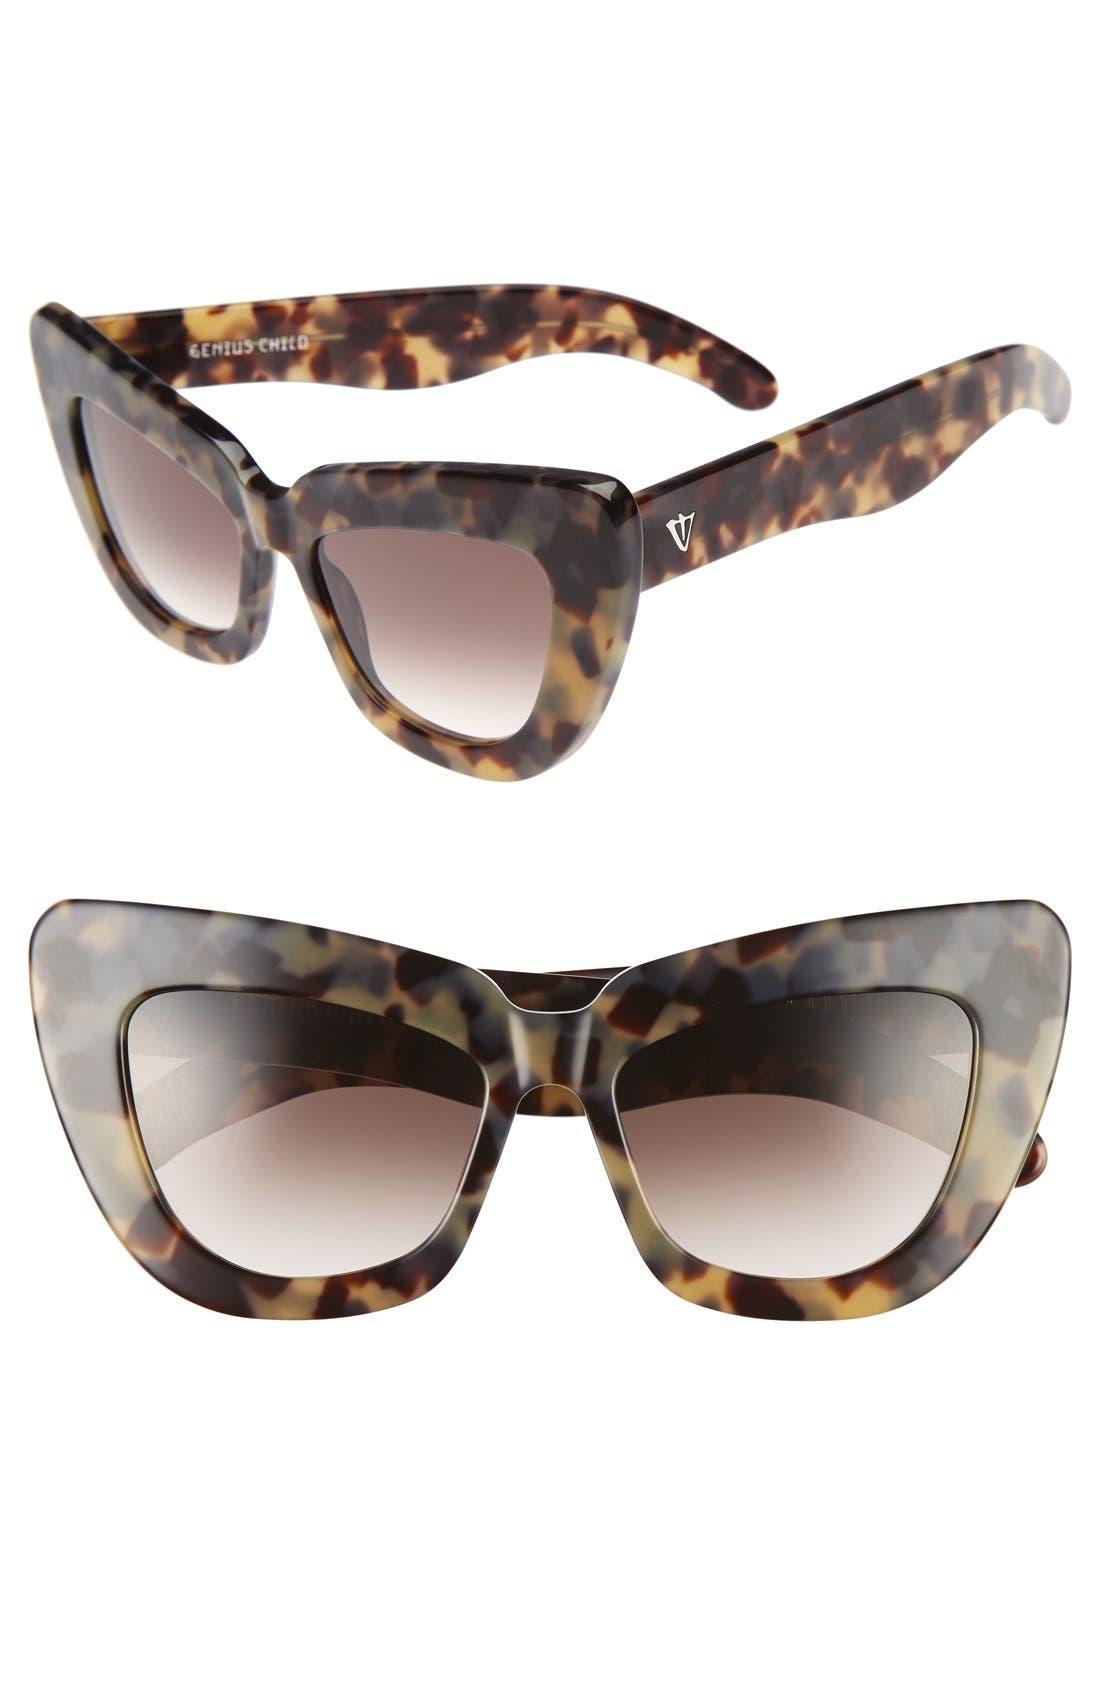 VALLEY 50mm Genius Child Cat Eye Sunglasses